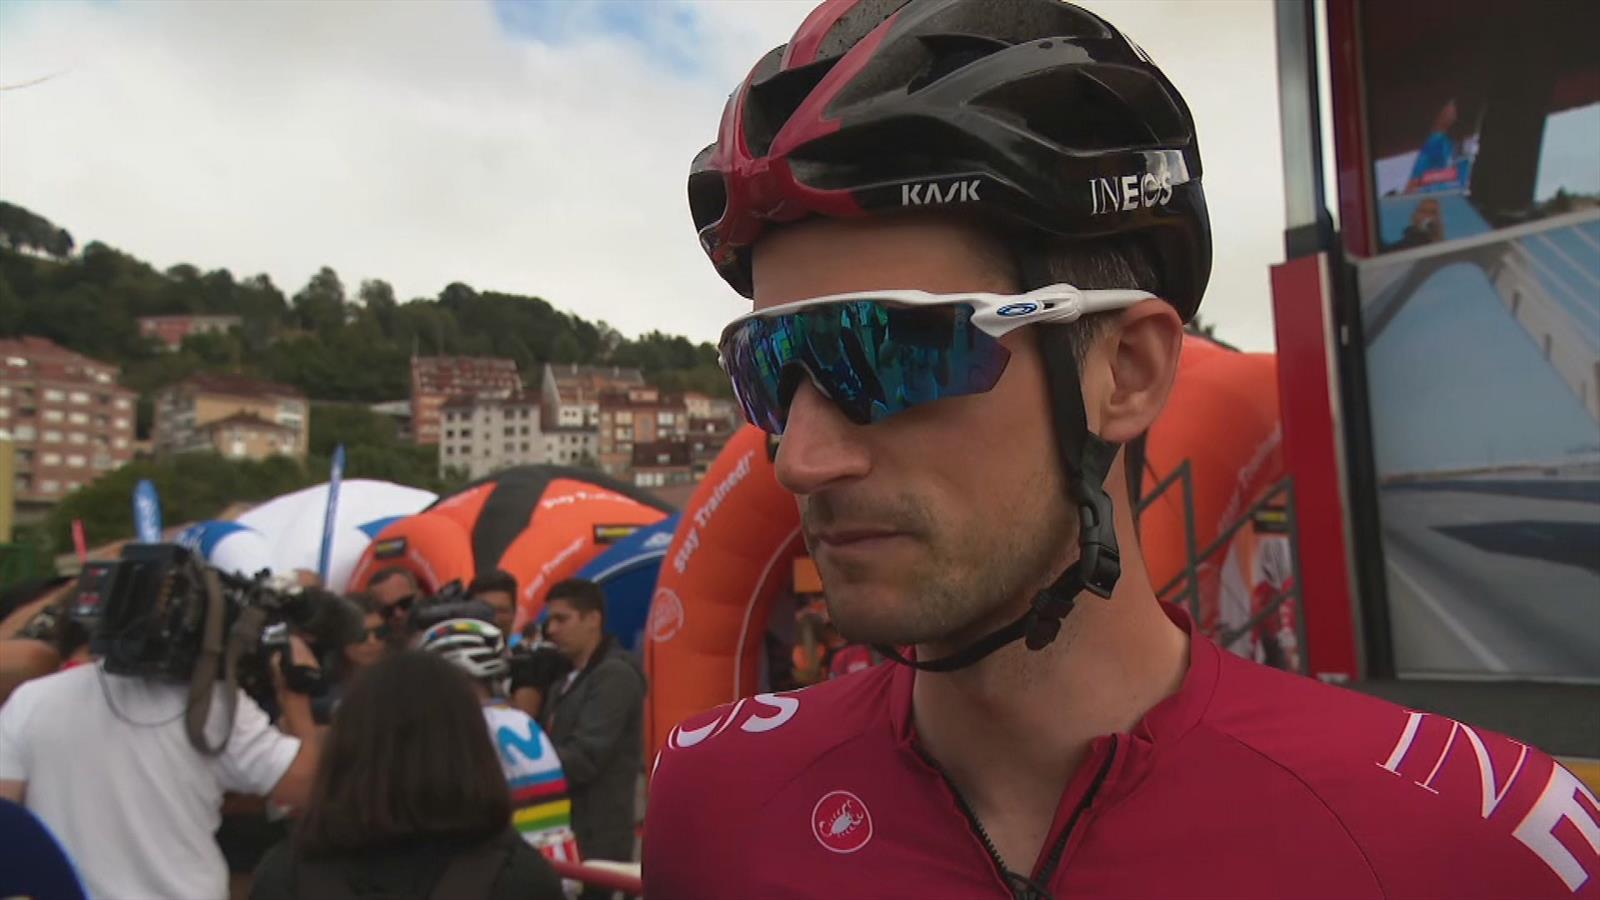 Wout Poels over lastige etappe 15 Vuelta a Espana: 'Ligt me goed'